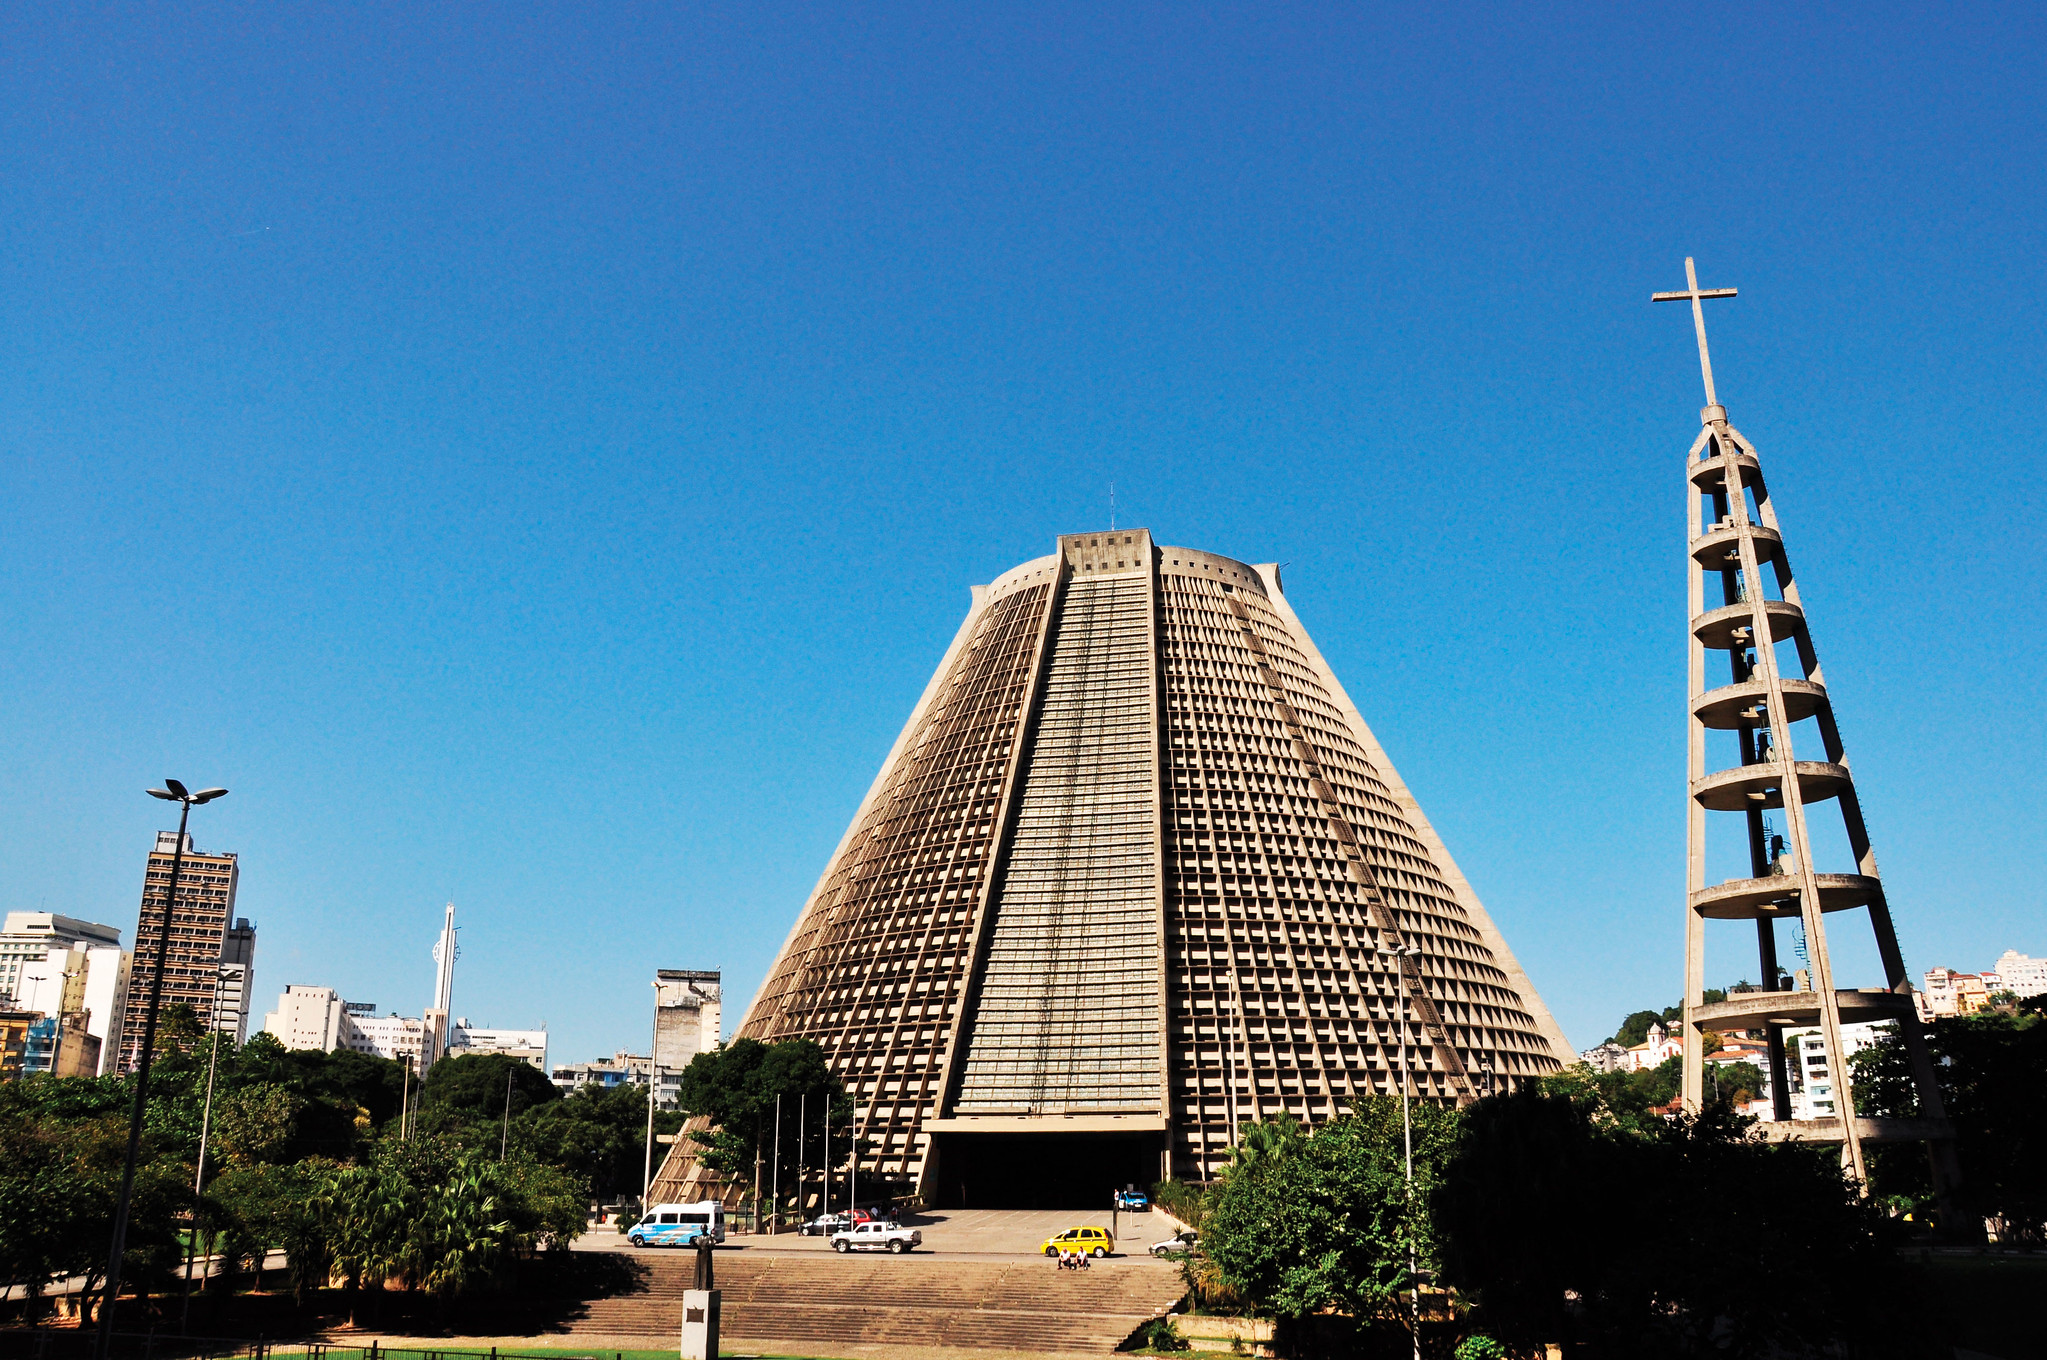 Catedral Metropolitana do Rio